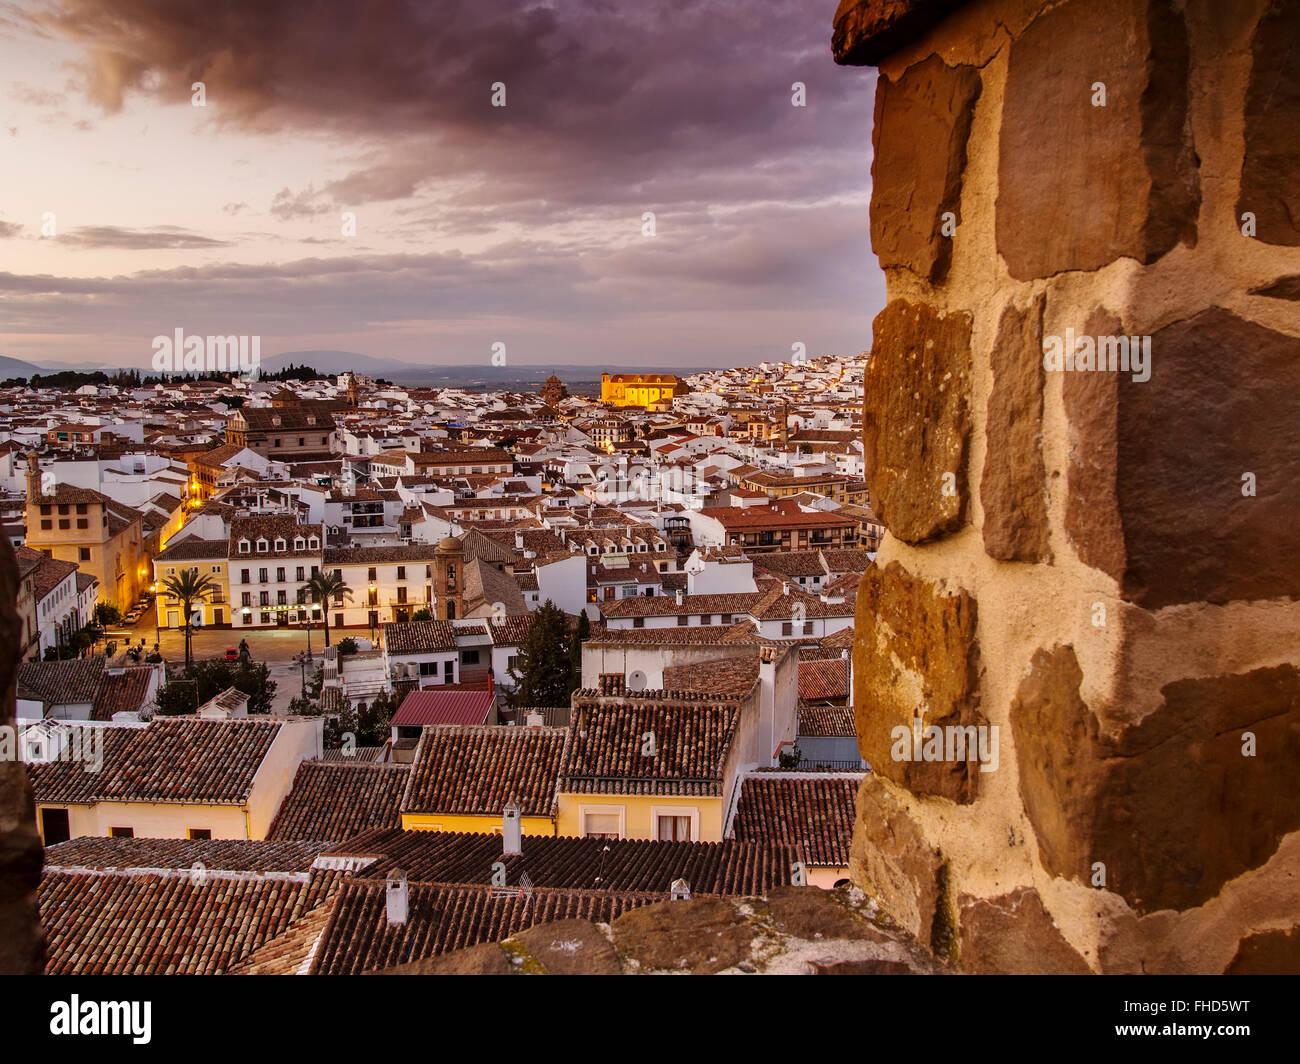 Sonnenuntergang, monumentale Stadt Antequera, Provinz Malaga. Andalusien Südspanien Stockbild